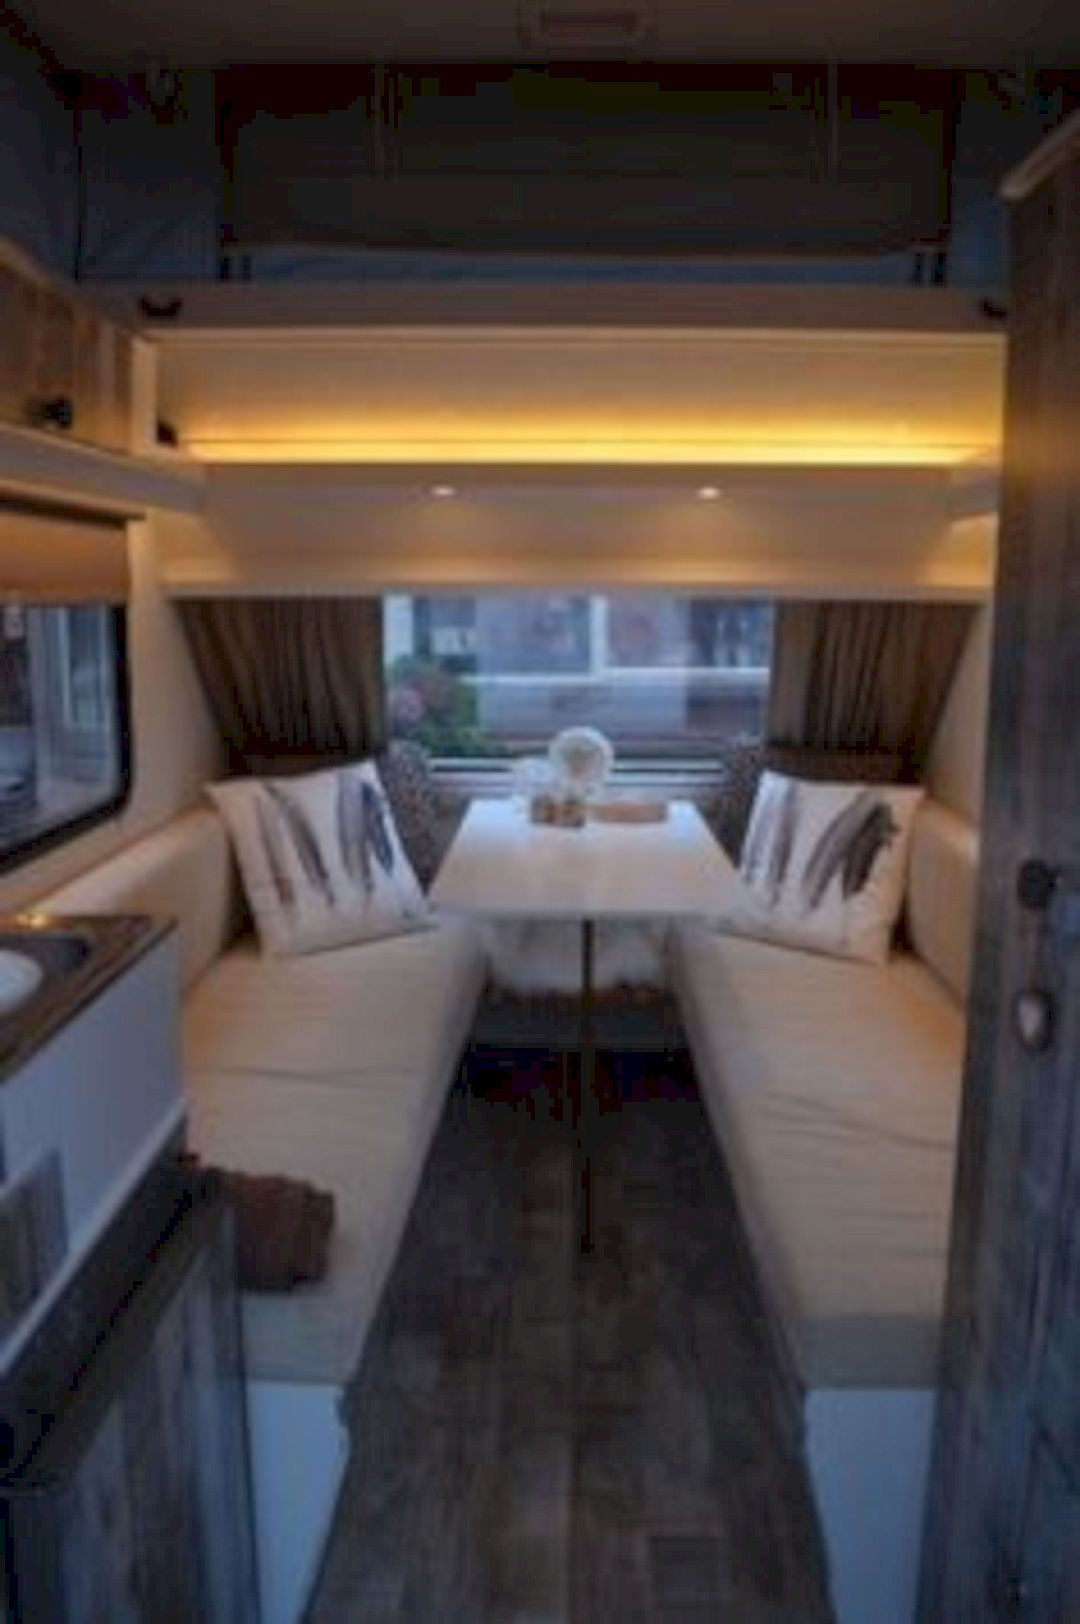 15 Campervan Interior Design Ideas for a Cozy Camping Time